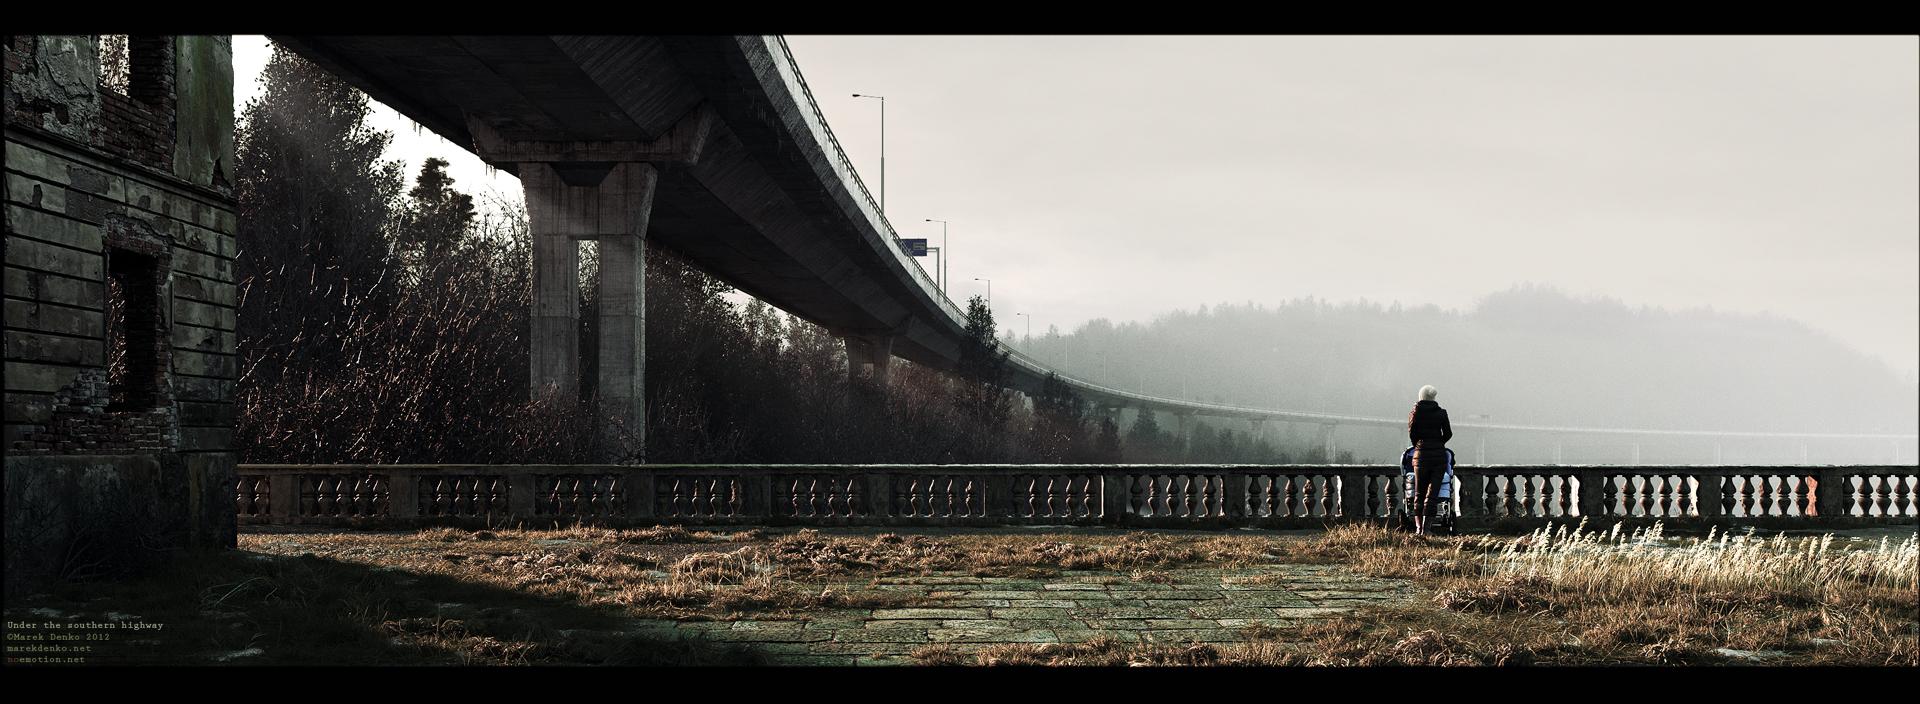 Marek Denko - Under The Southern Highway